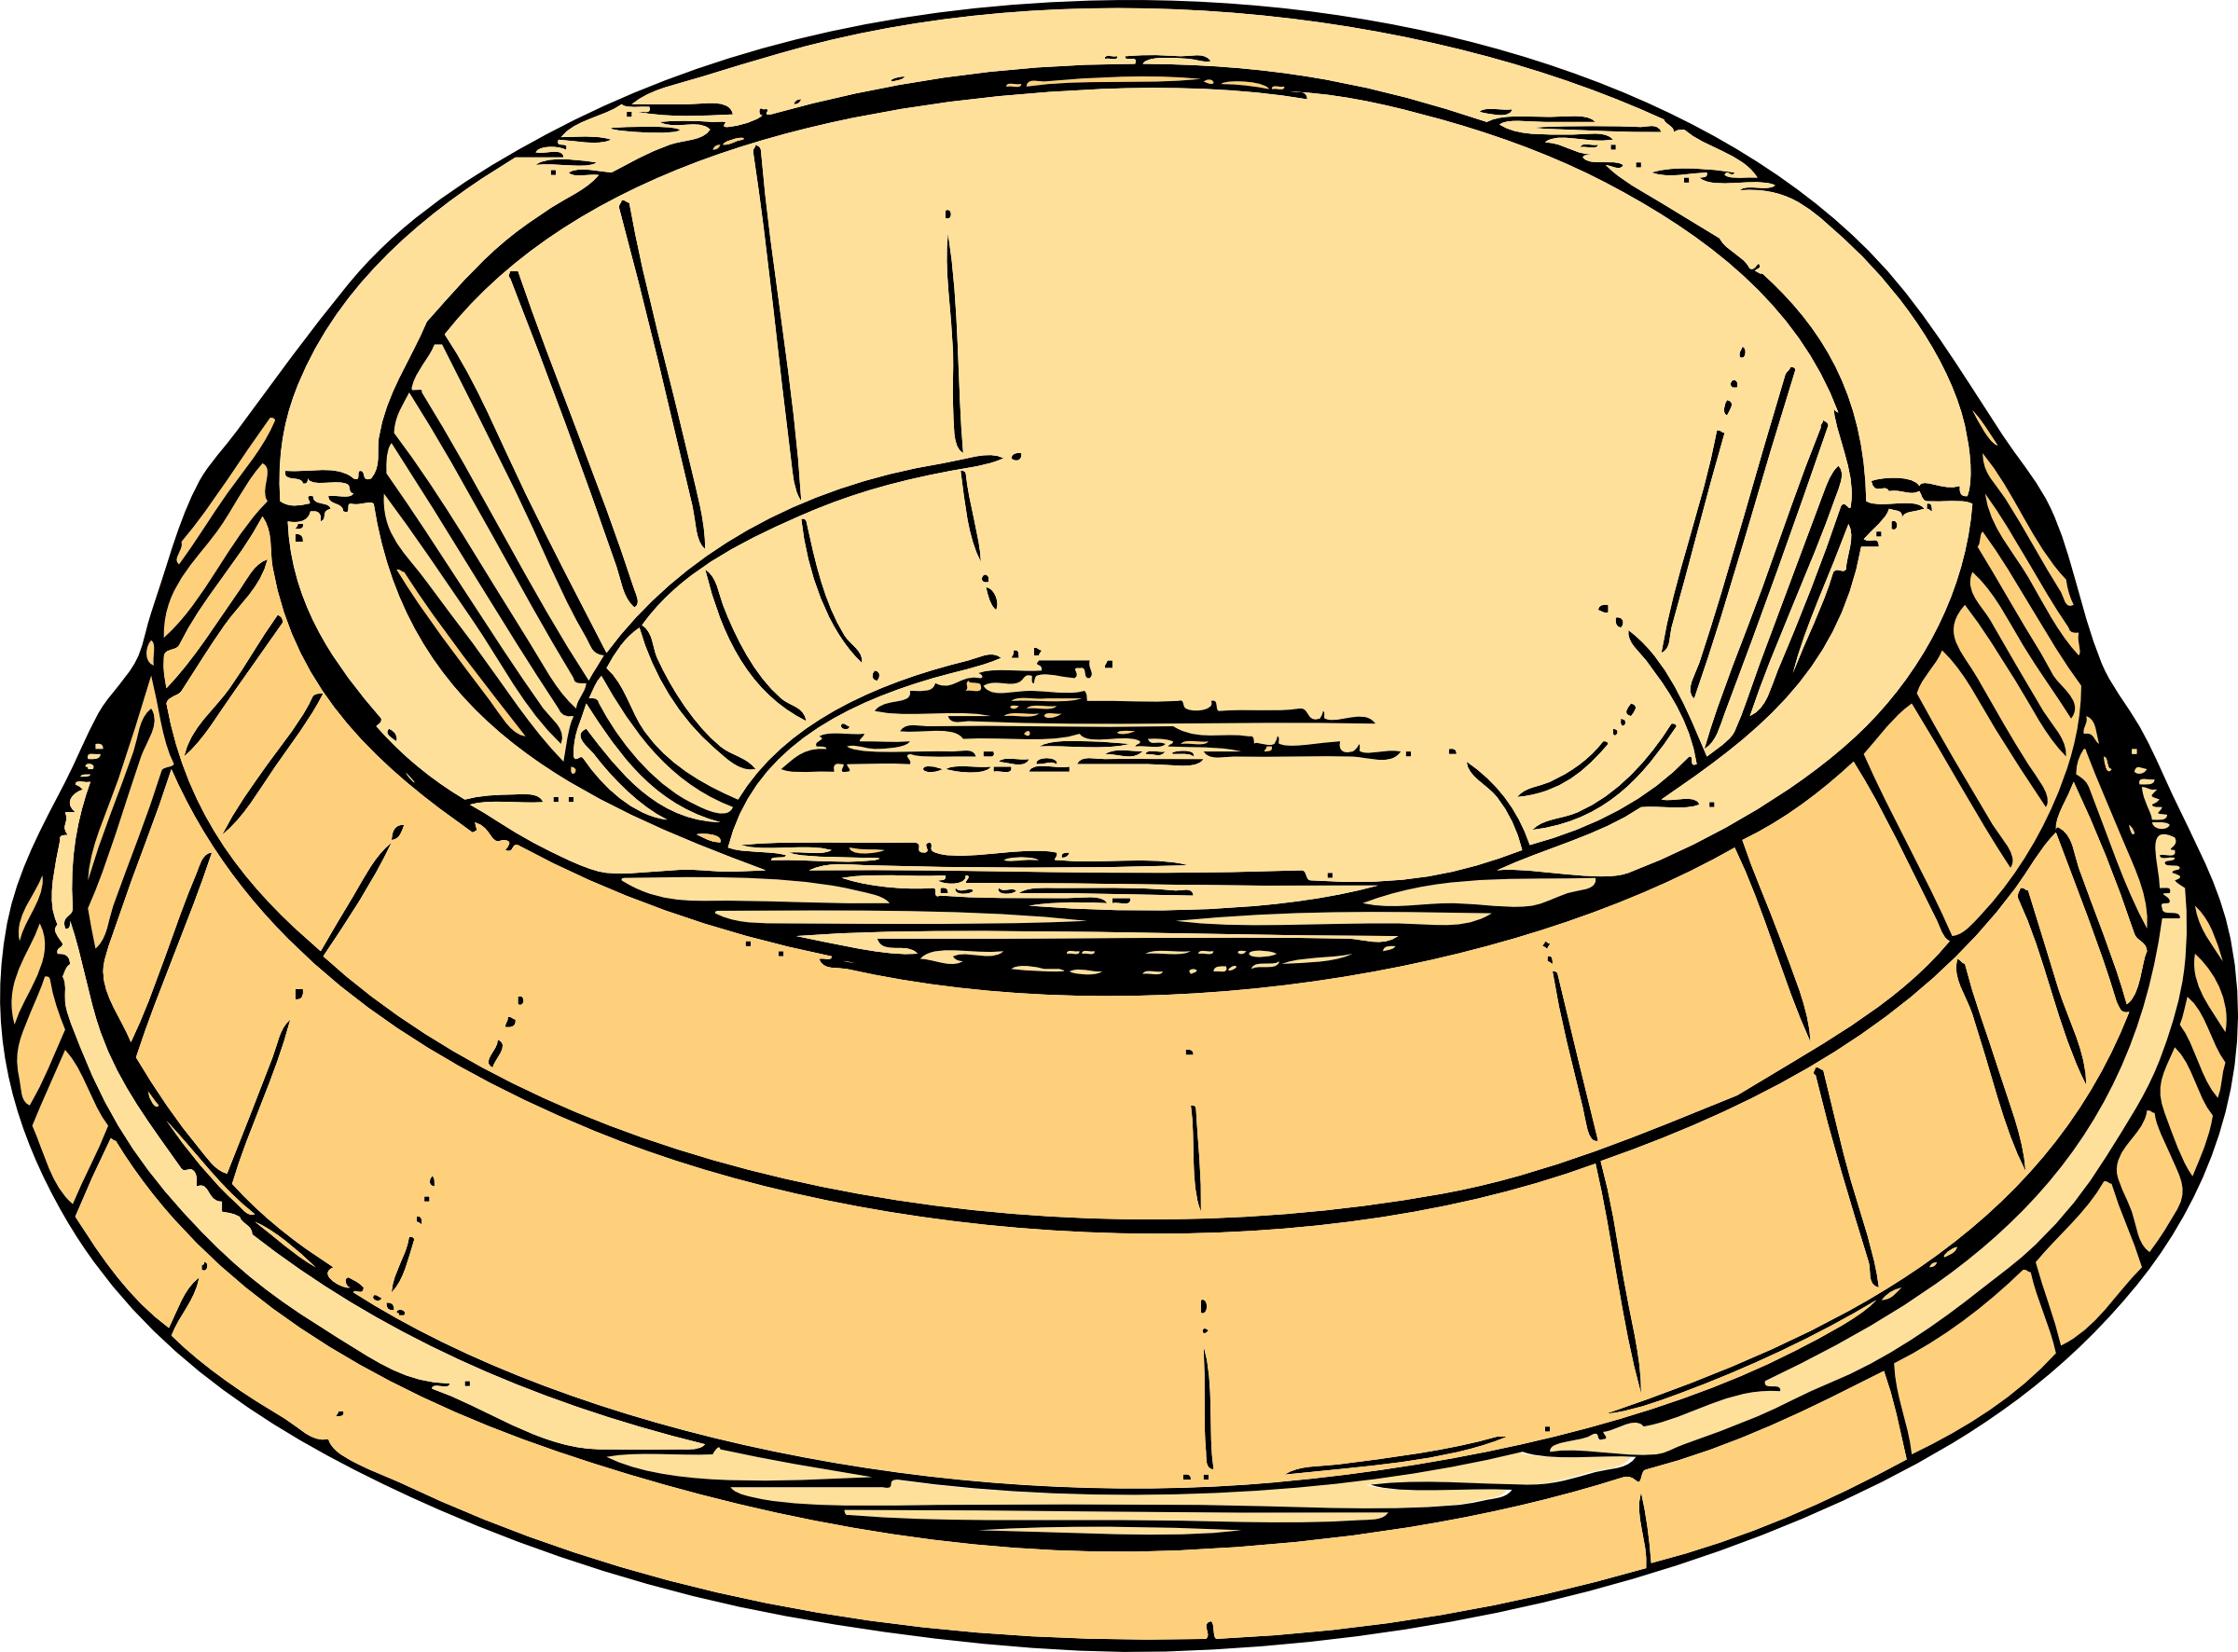 Dog Food Bowl Cartoon